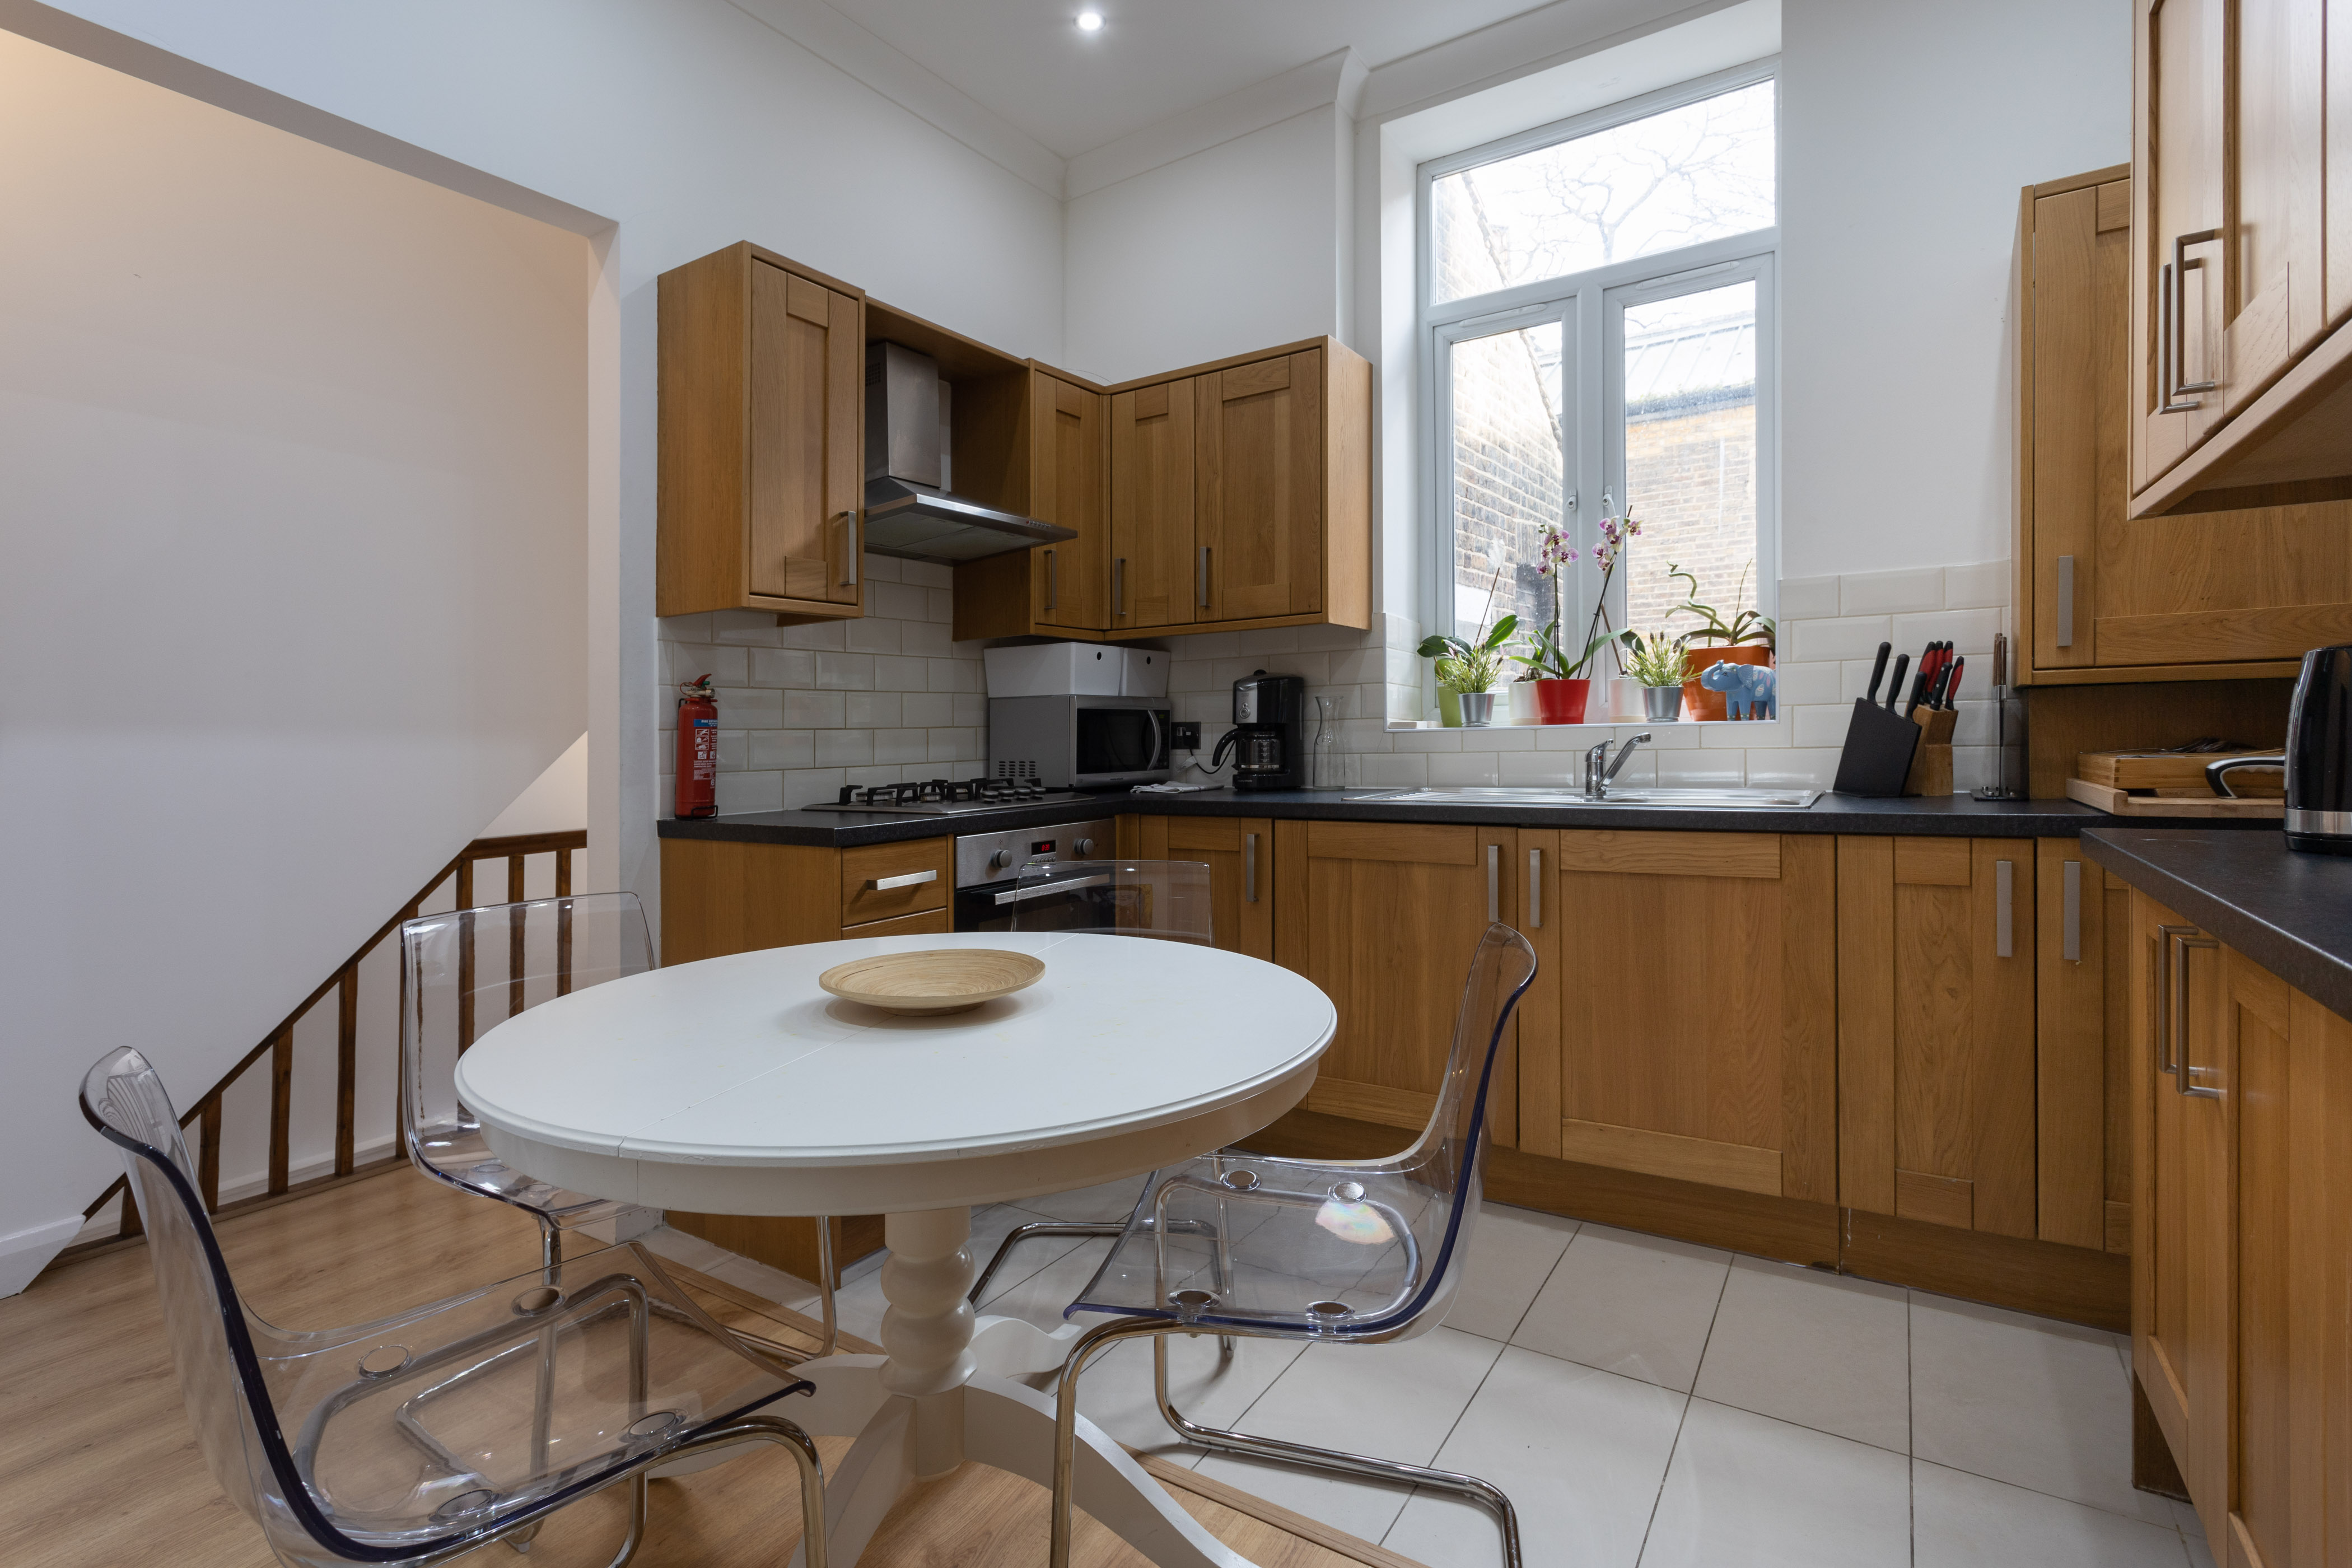 Apartment King s Cross Eurostar Double Room - Shared Bathroom - Shared Kitchen  ROOM 4  photo 26059383